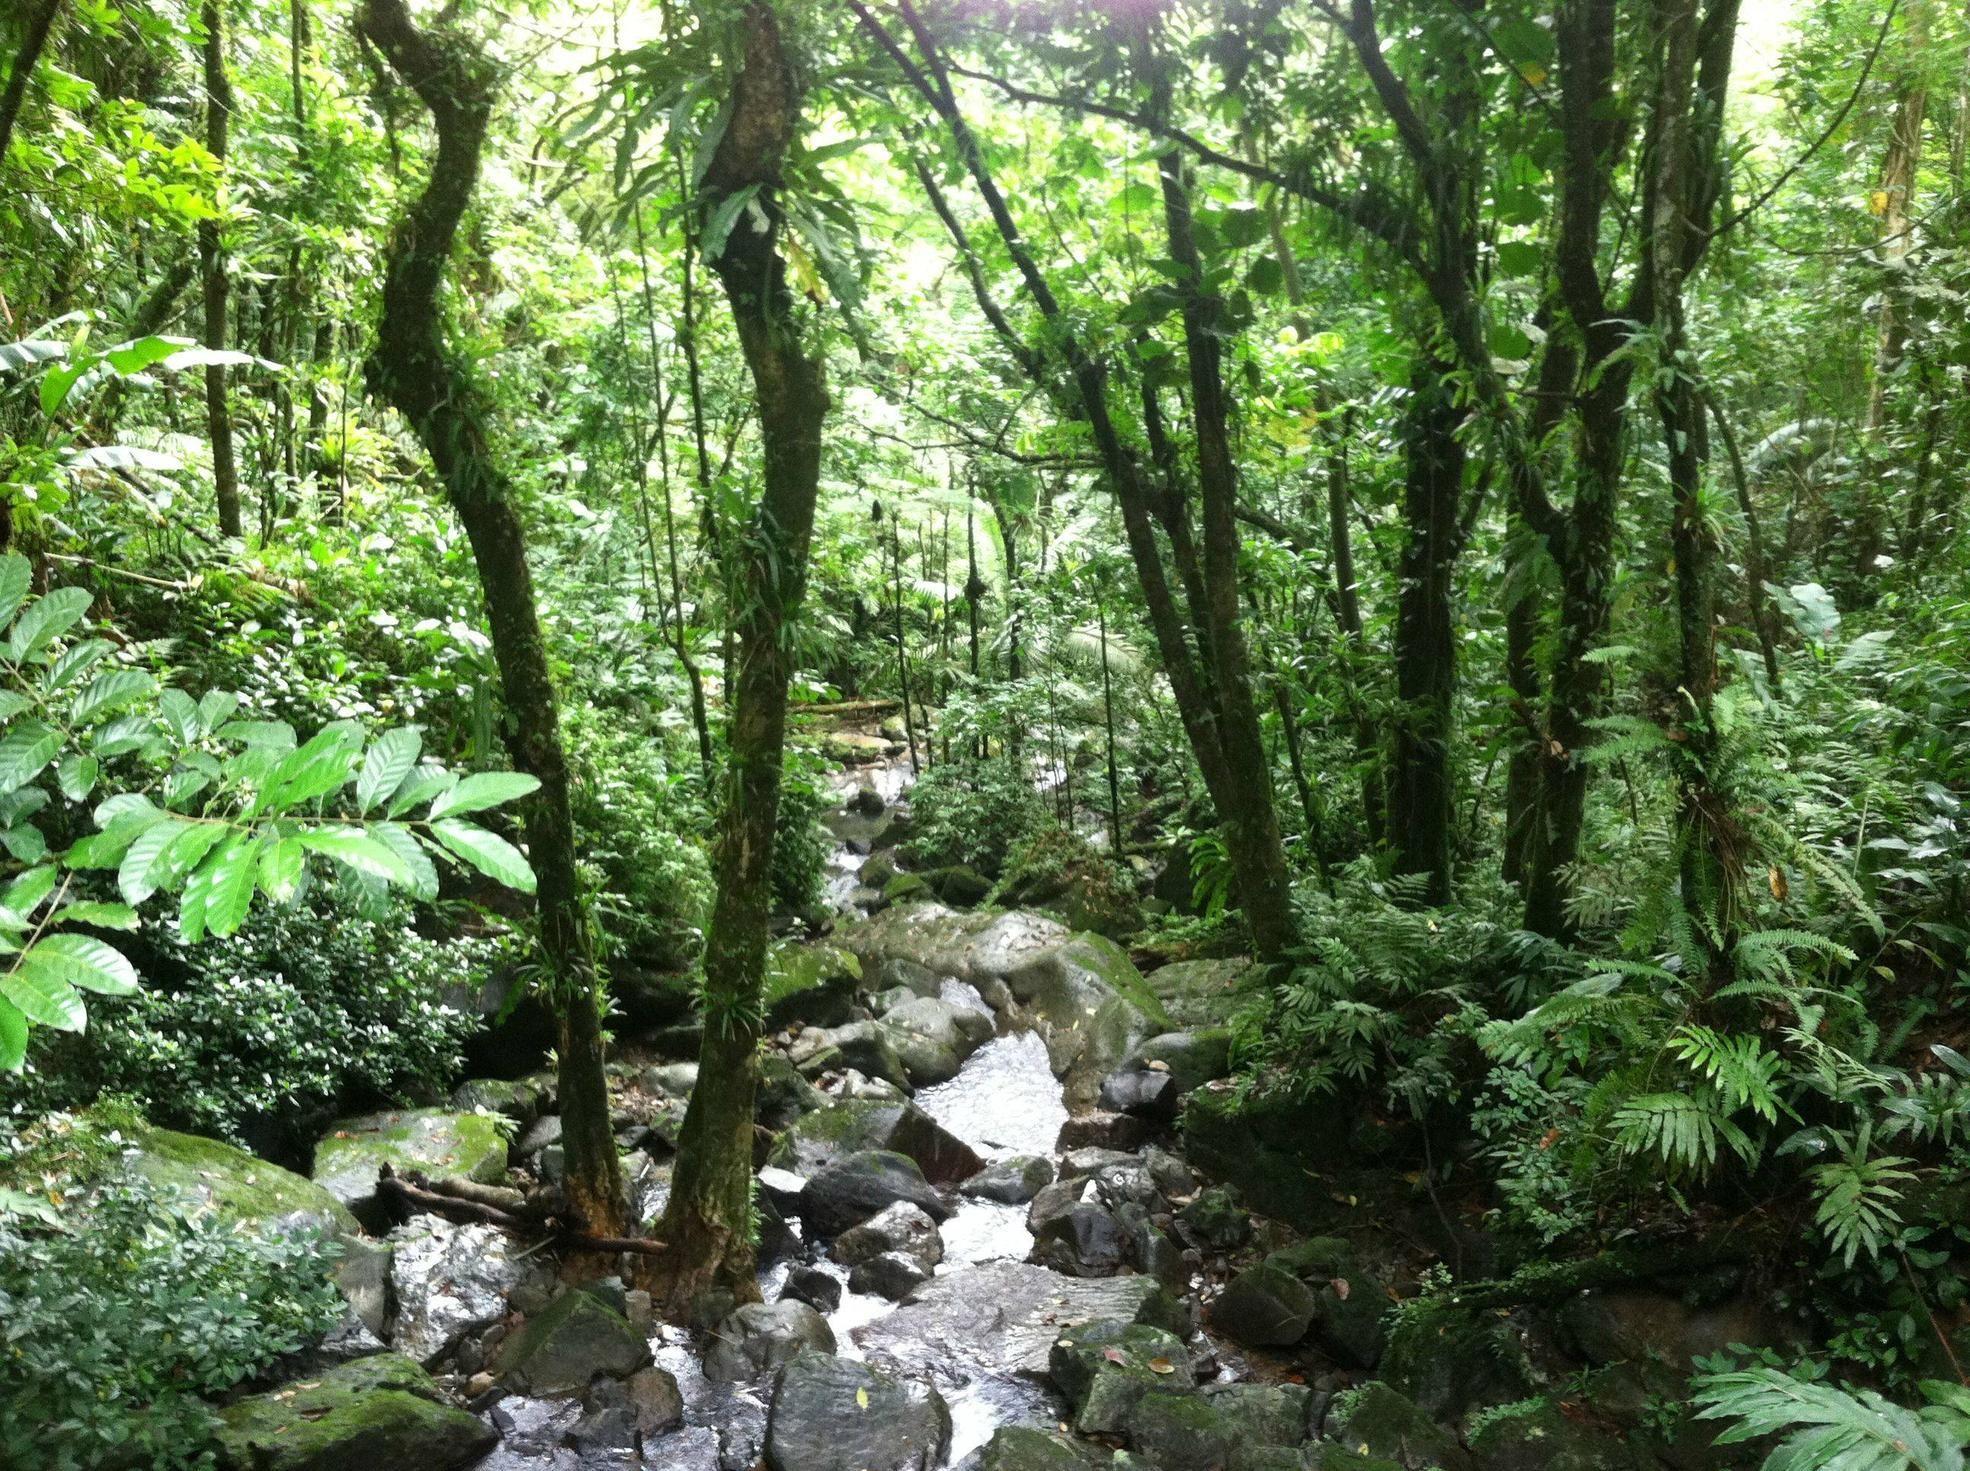 Puerto Rico Rainforest